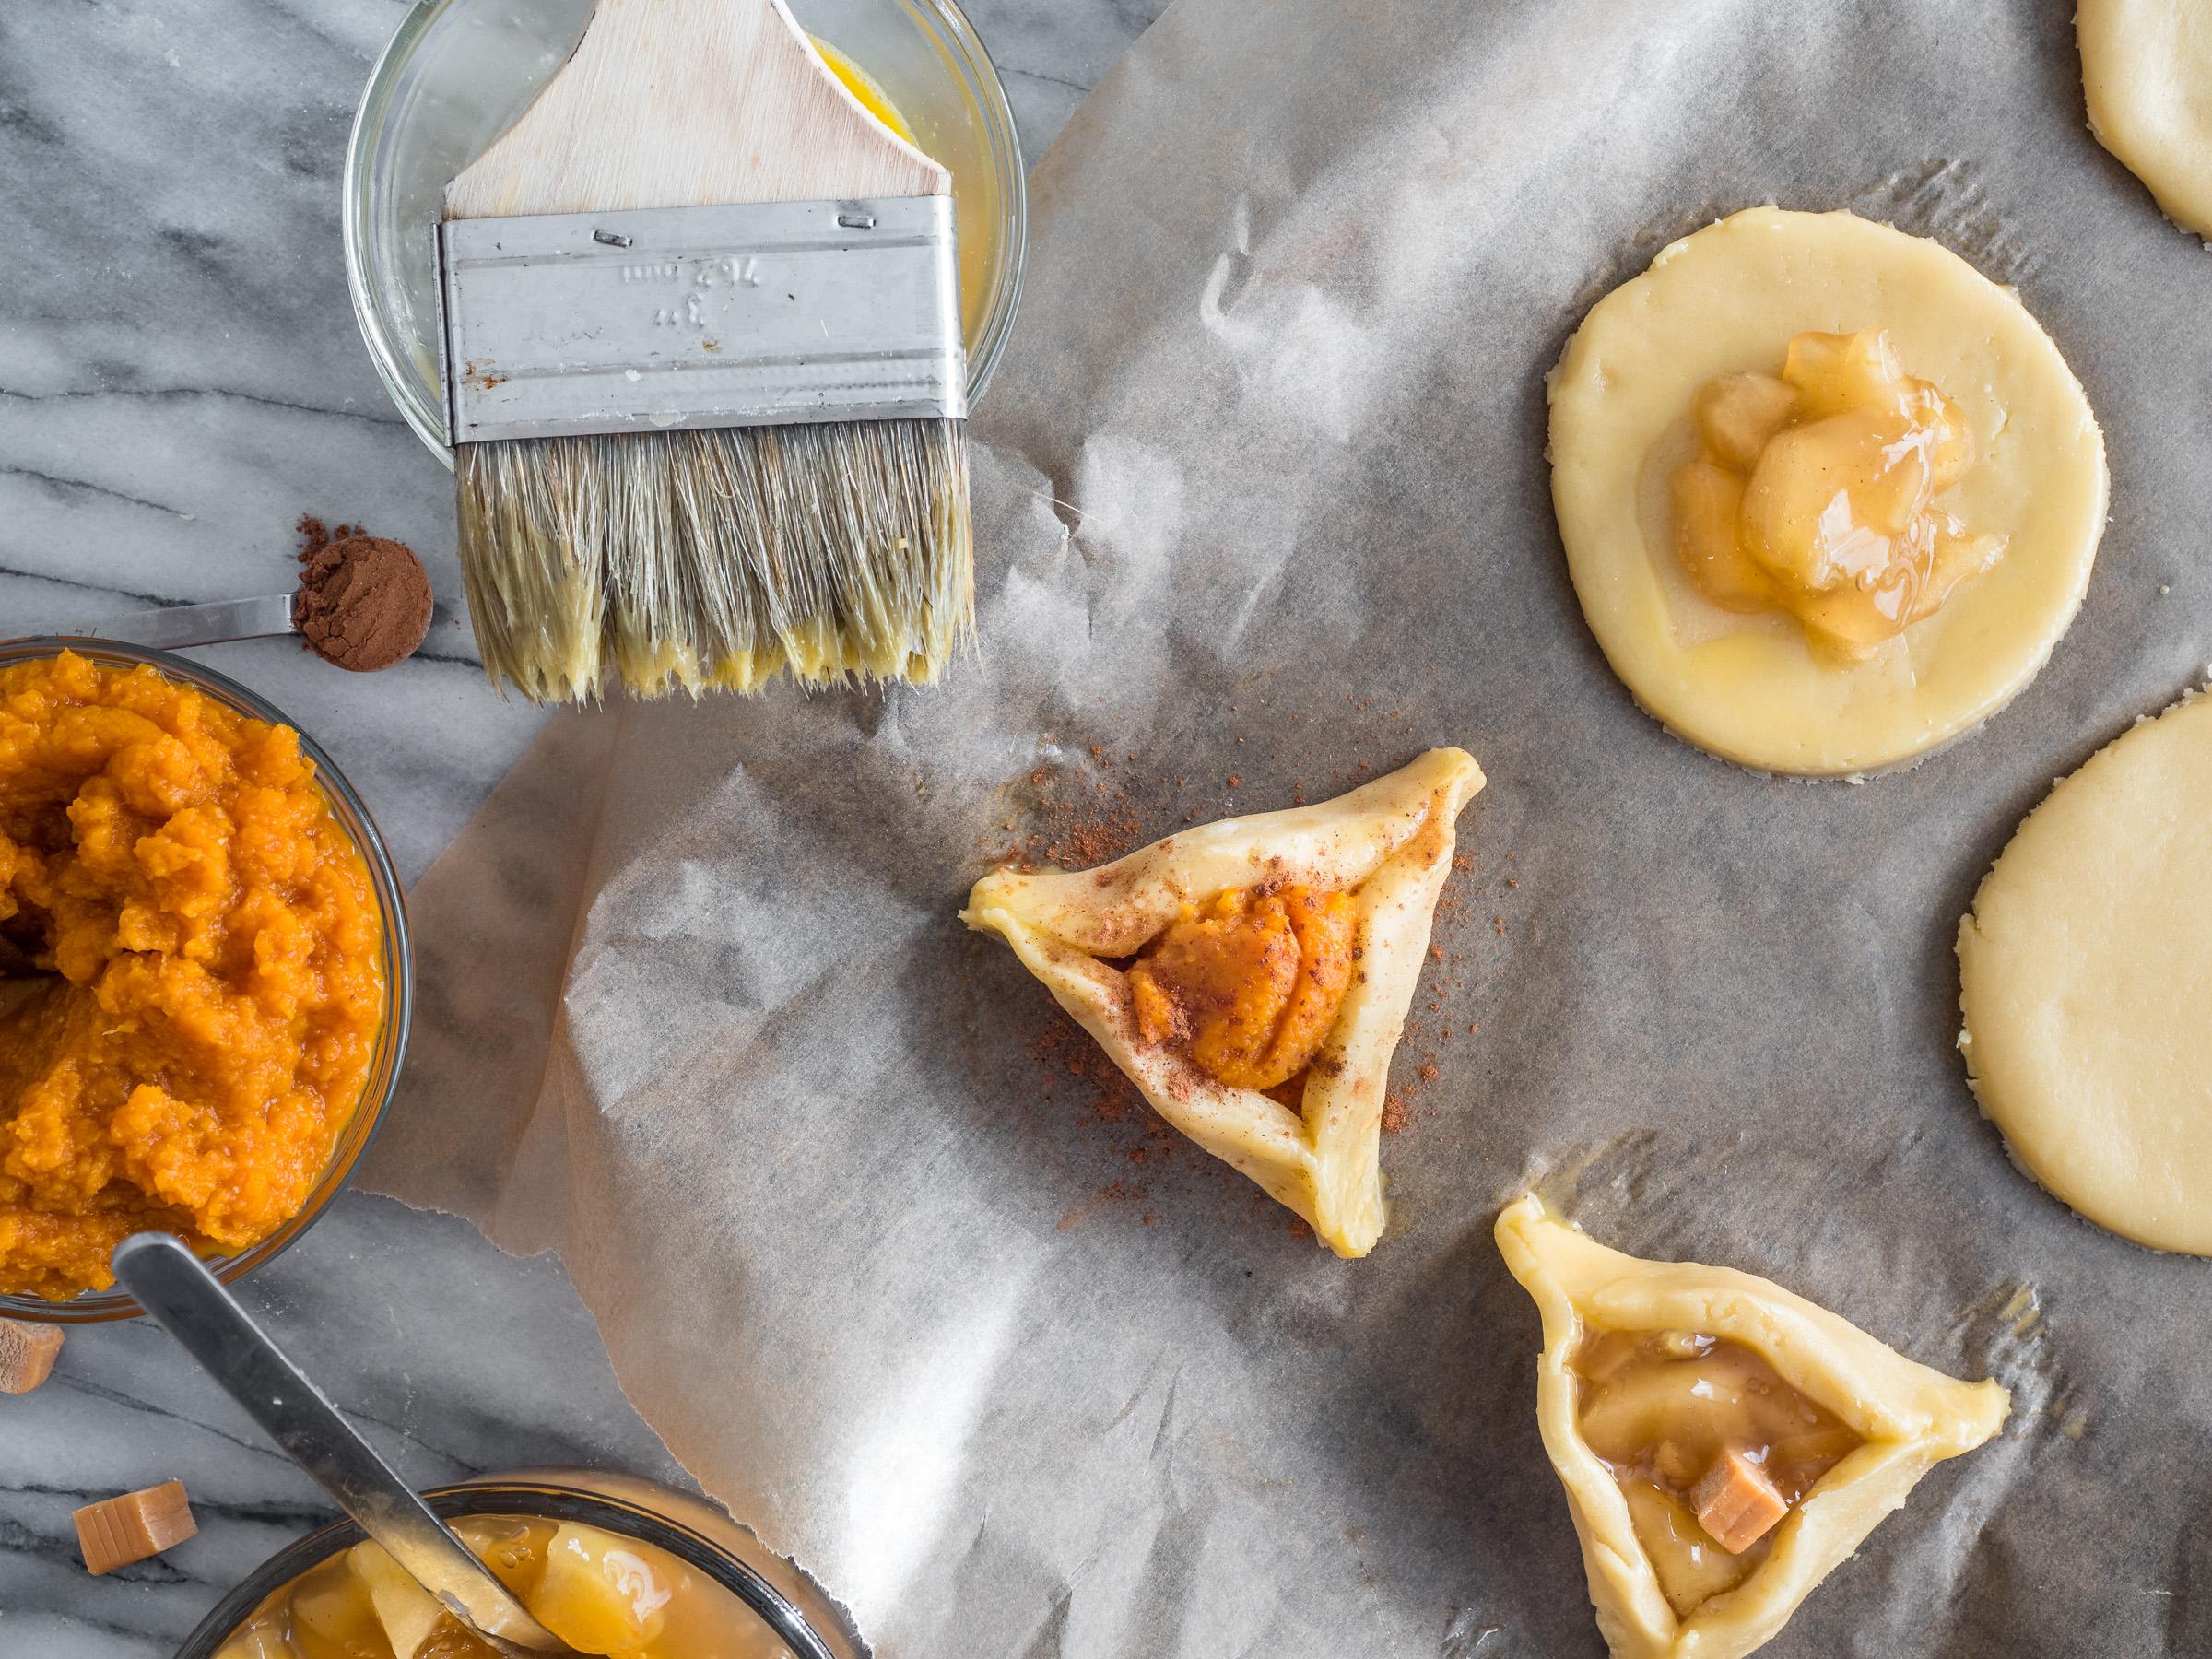 hamantaschens jeremy pawlowski fare photo studios photography jew jewish purim food cooking bake baking